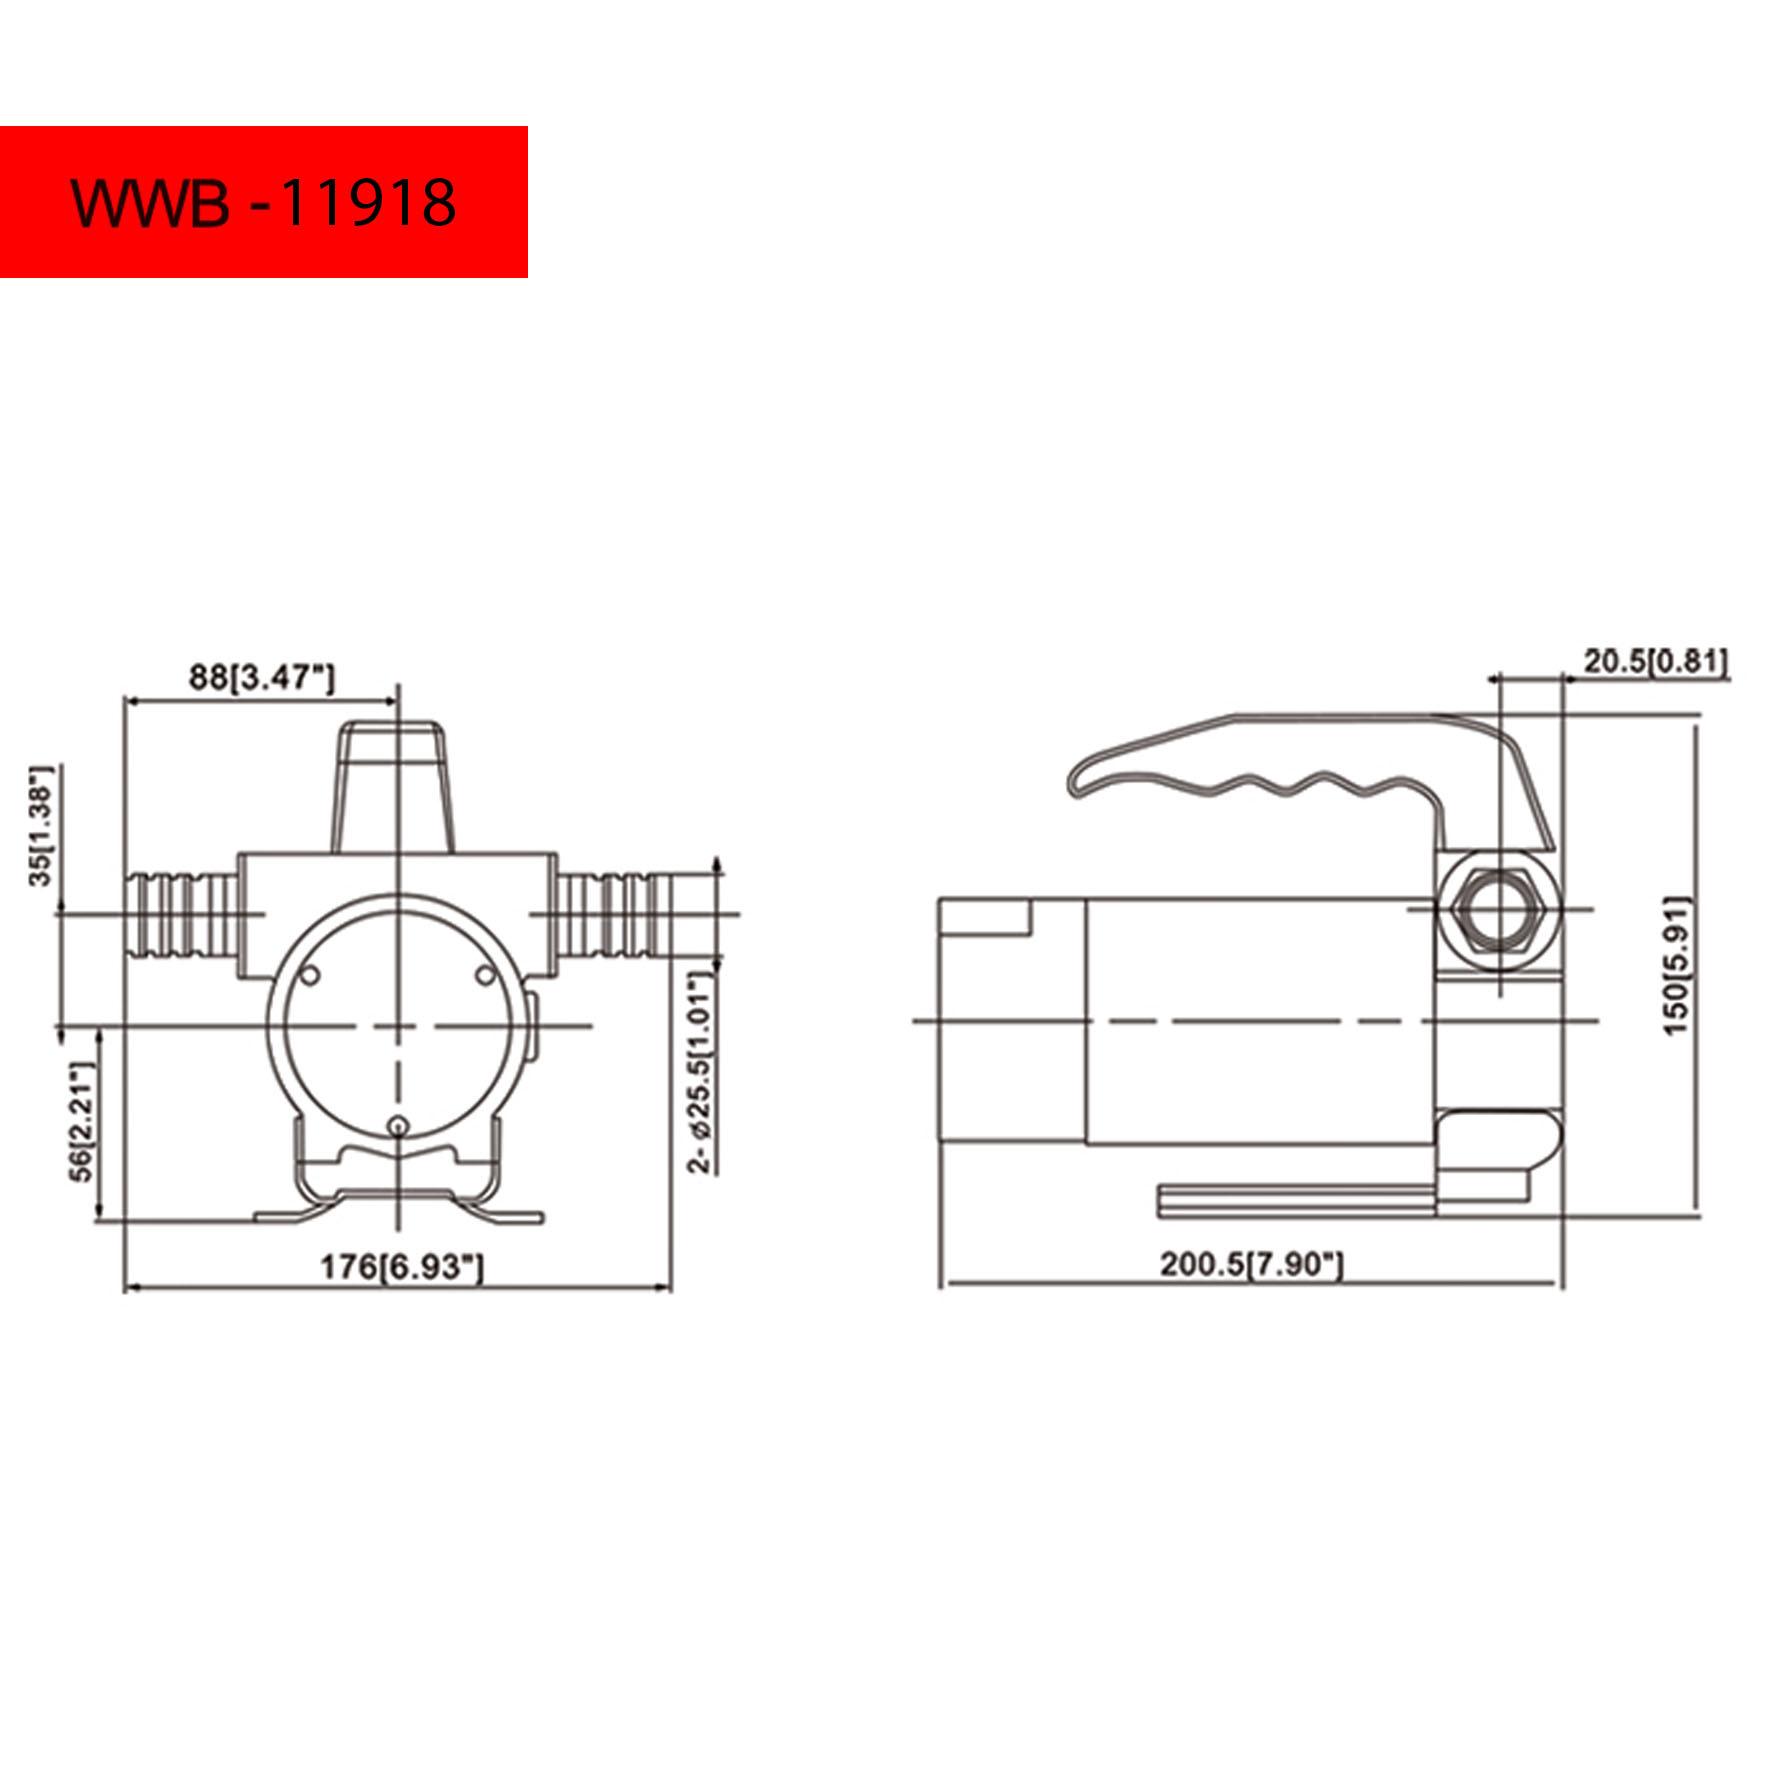 790 Gphsel Oil Fuel Transfer Pump